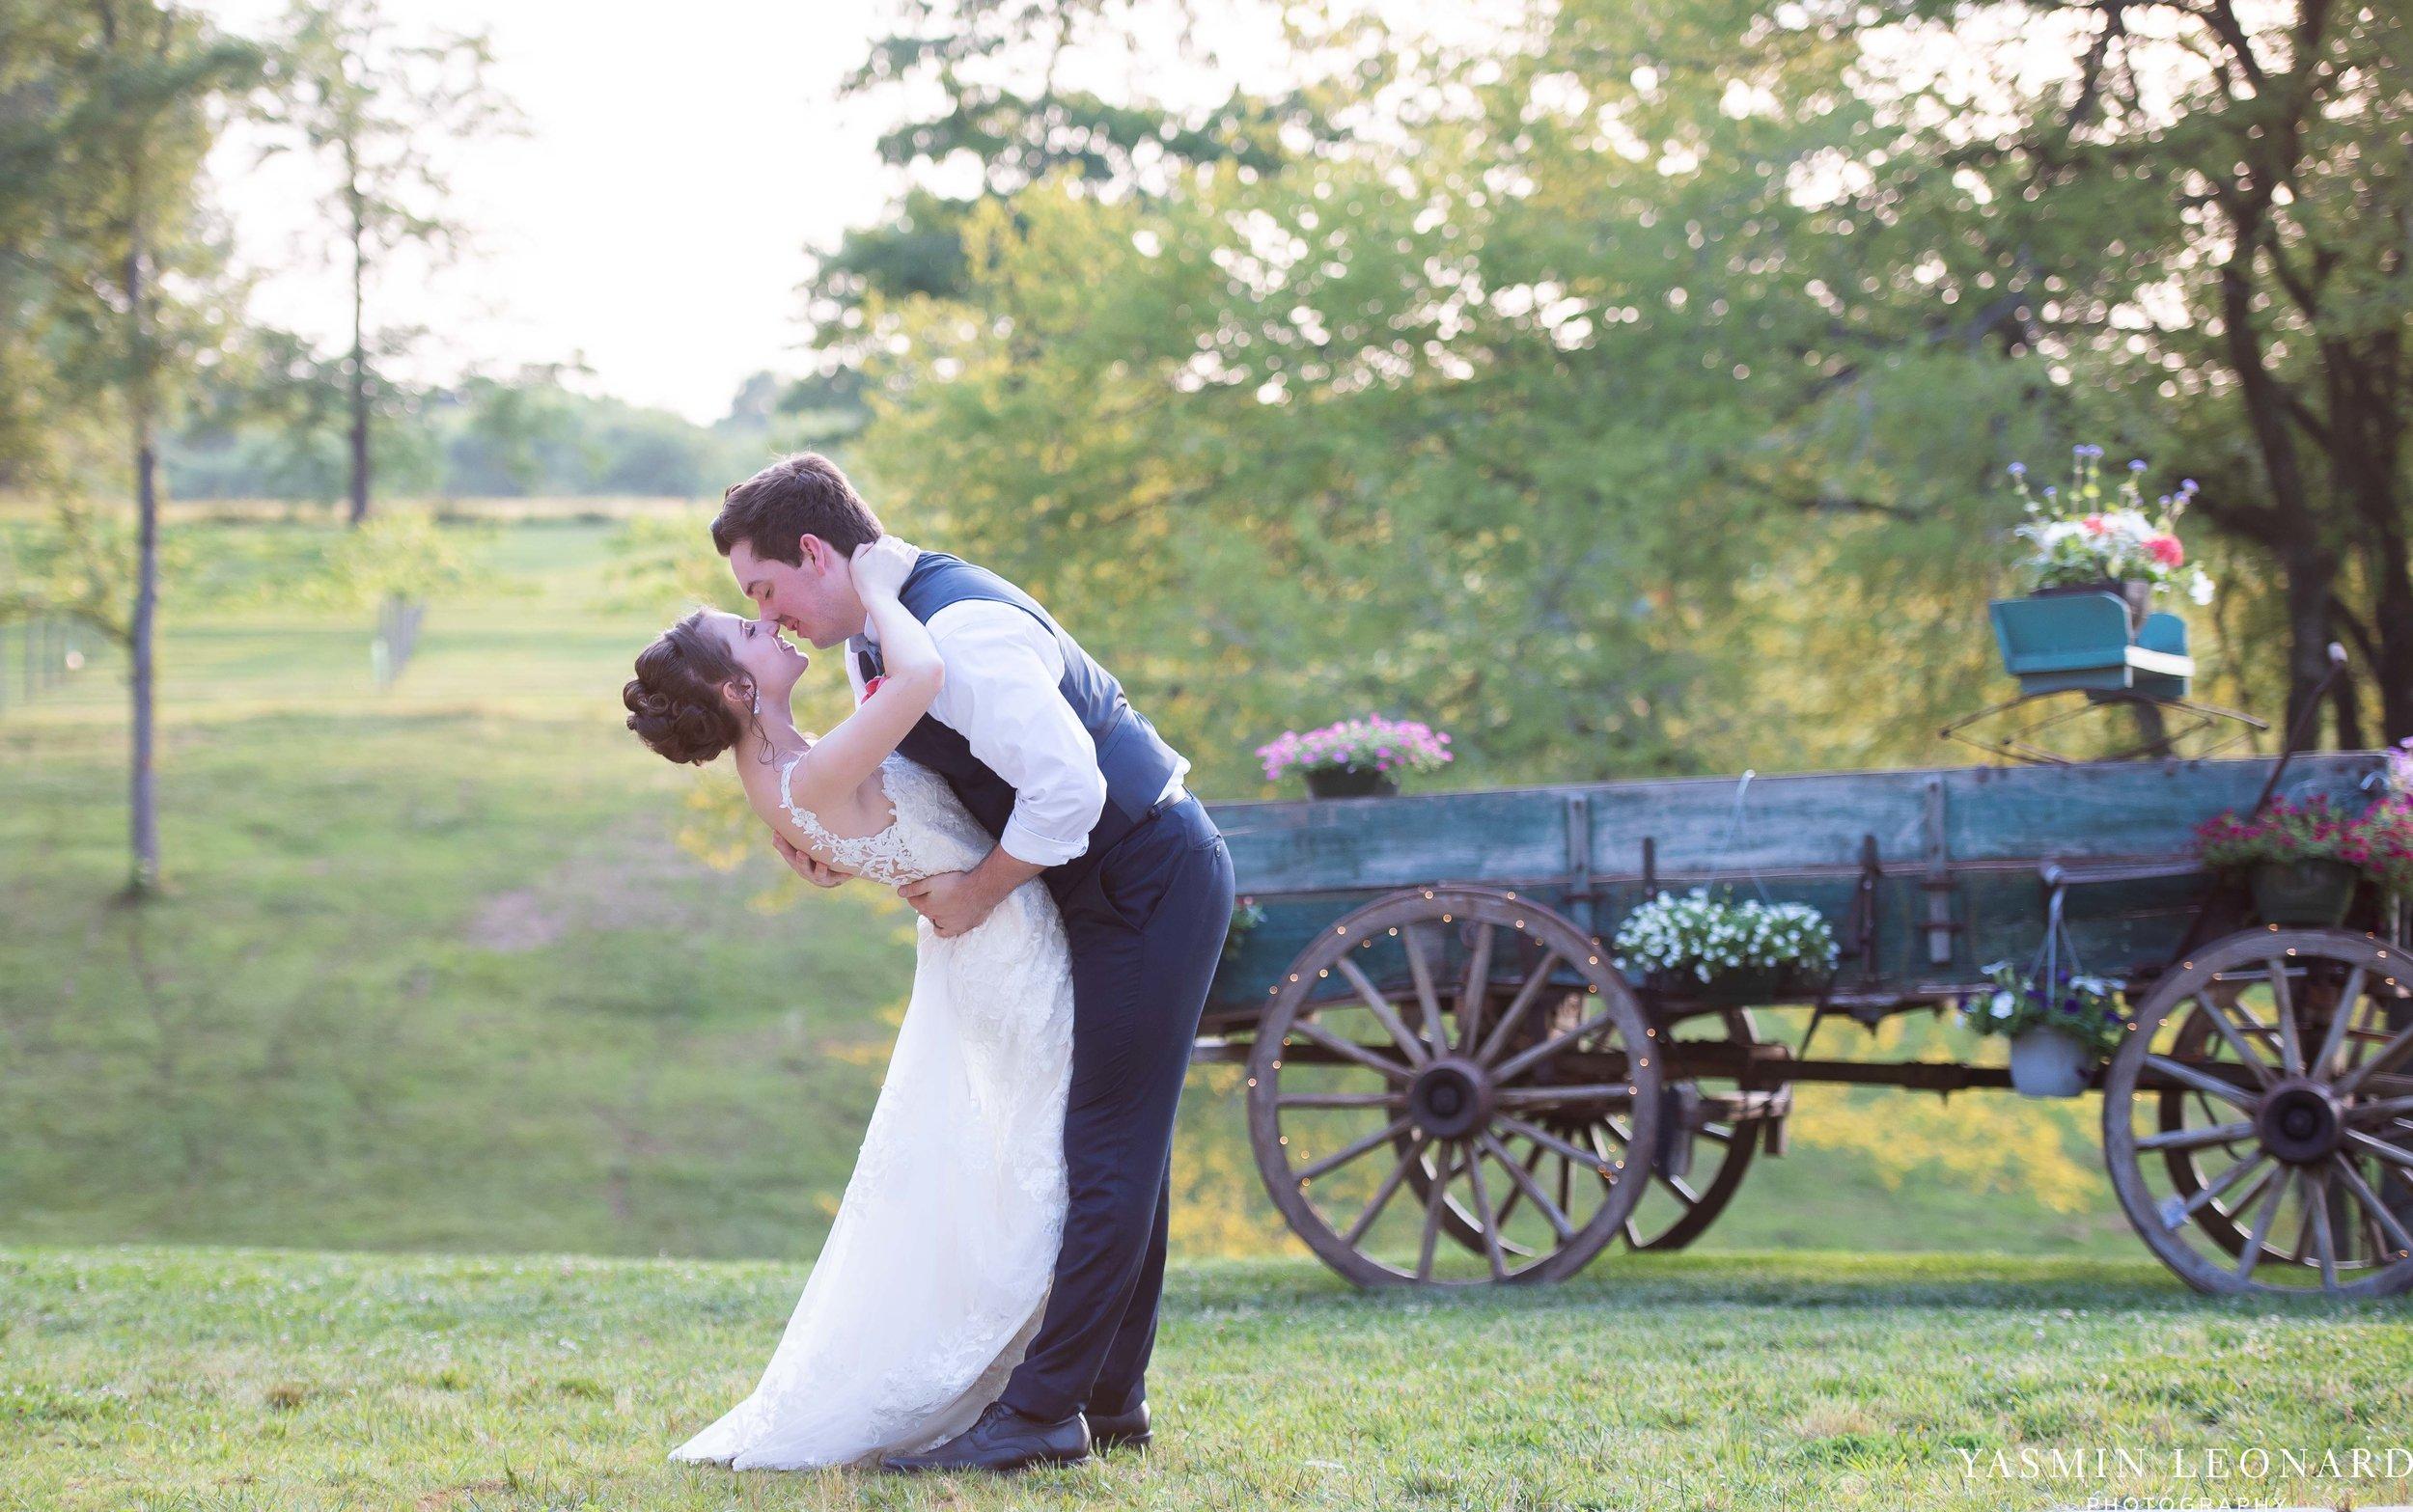 Old Homeplace Vineyard - NC Weddings - Outdoor Summer Weddings - Peony Boutique - Vineyard Wedding - NC Photographer - Yasmin Leonard Photography-59.jpg